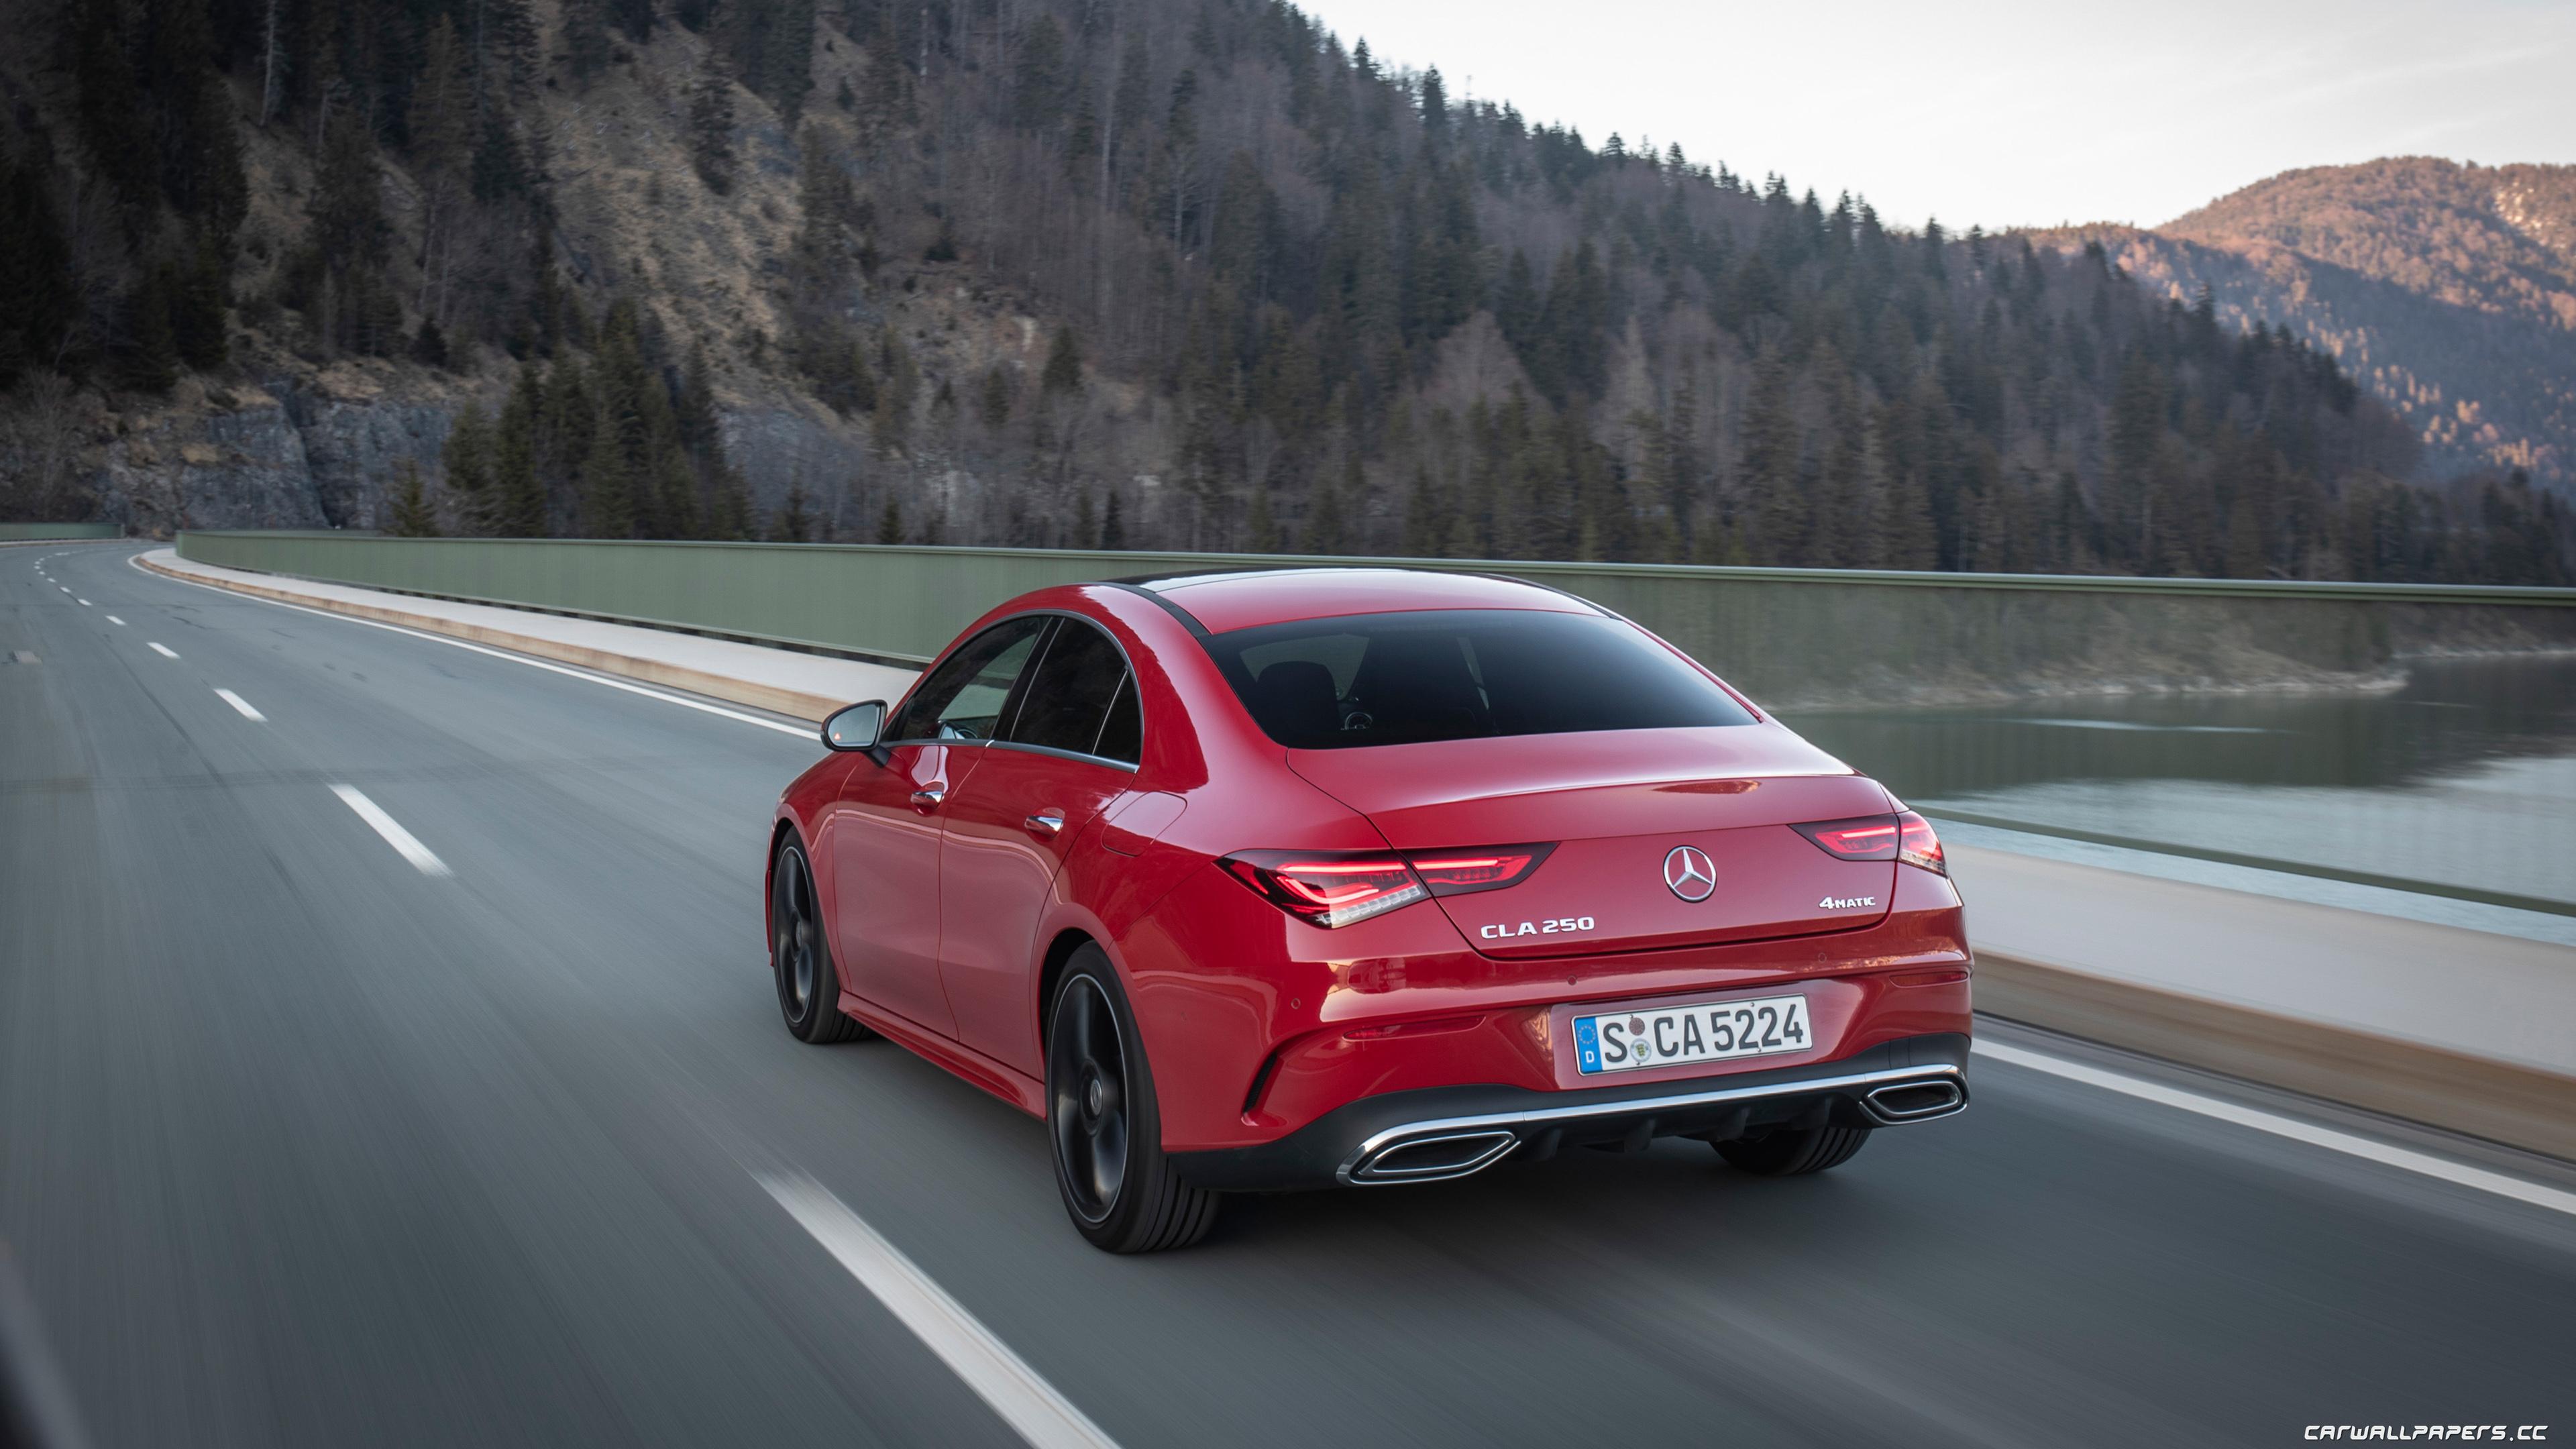 Cars Desktop Wallpapers Mercedes Benz Cla 250 4matic Amg